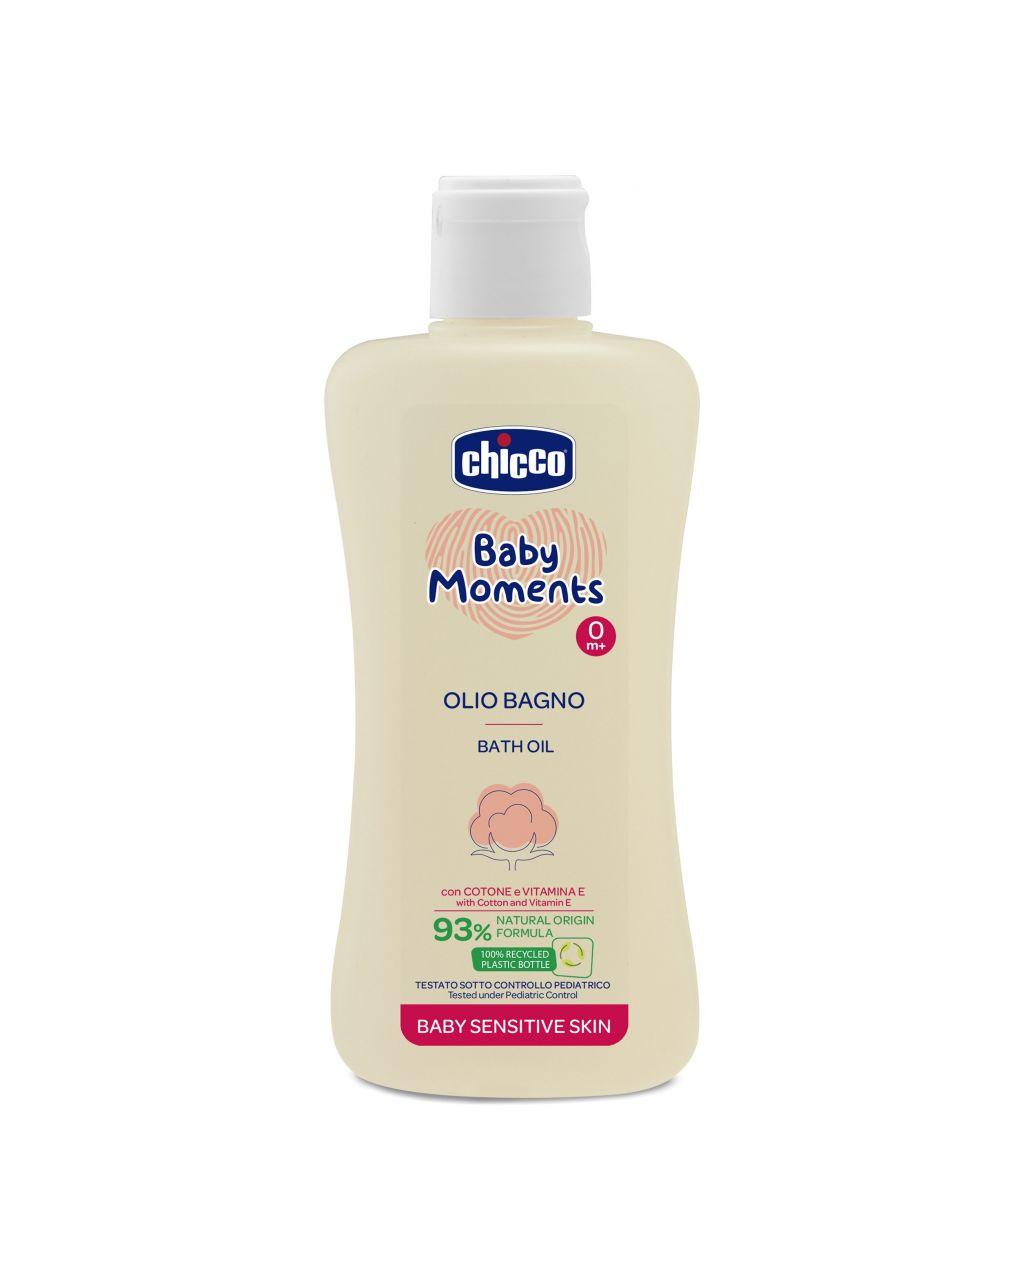 Olio bagno chicco baby moments sensitive skin - Chicco